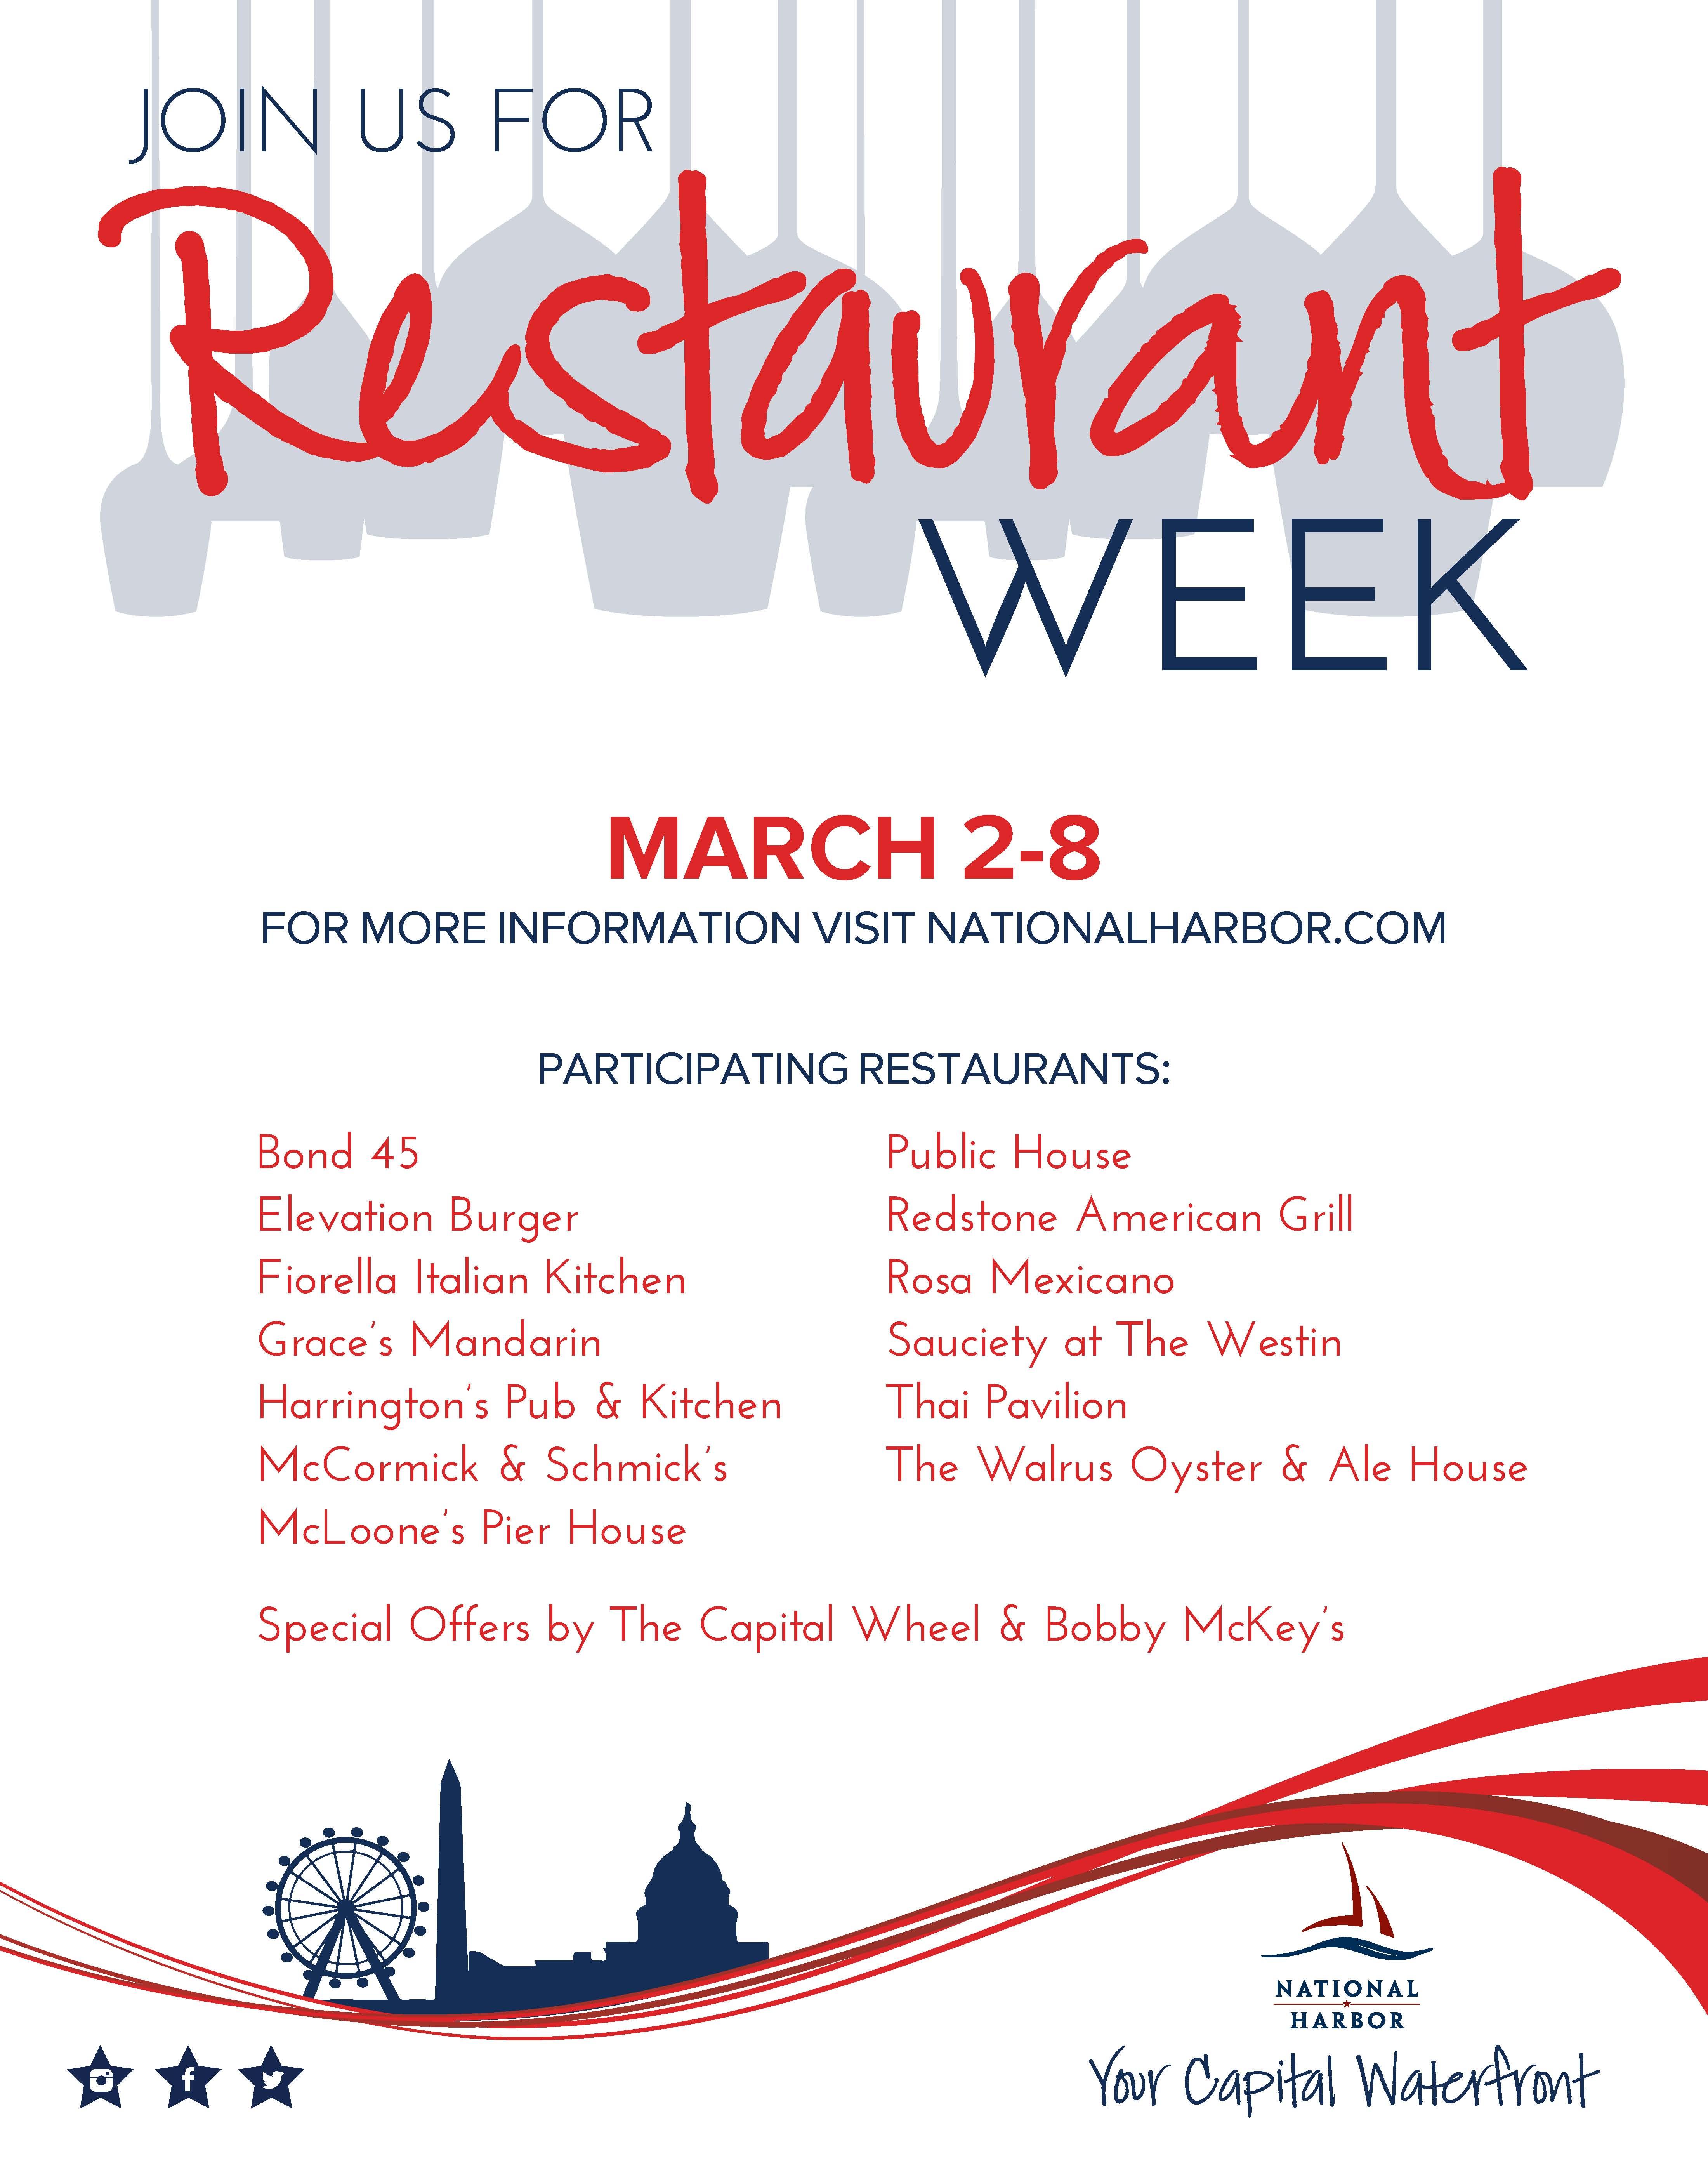 Pg County Restaurant Week Ichoosecheverly